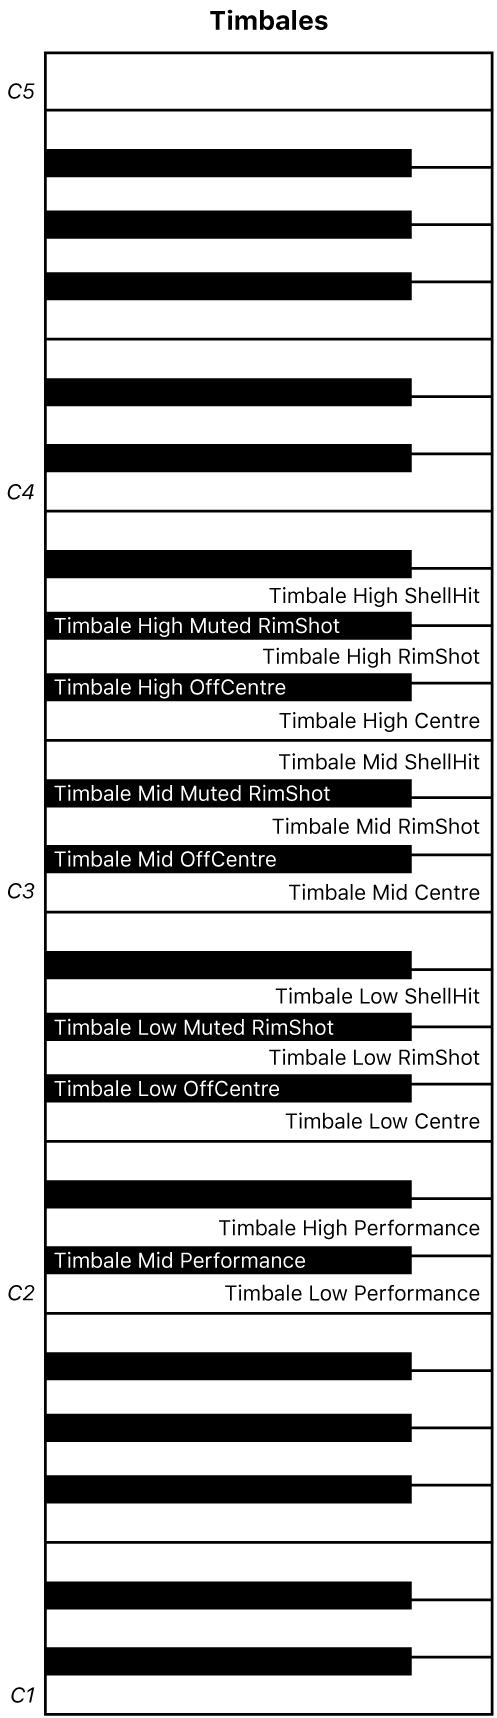 Figure. Timbales performance keyboard map.